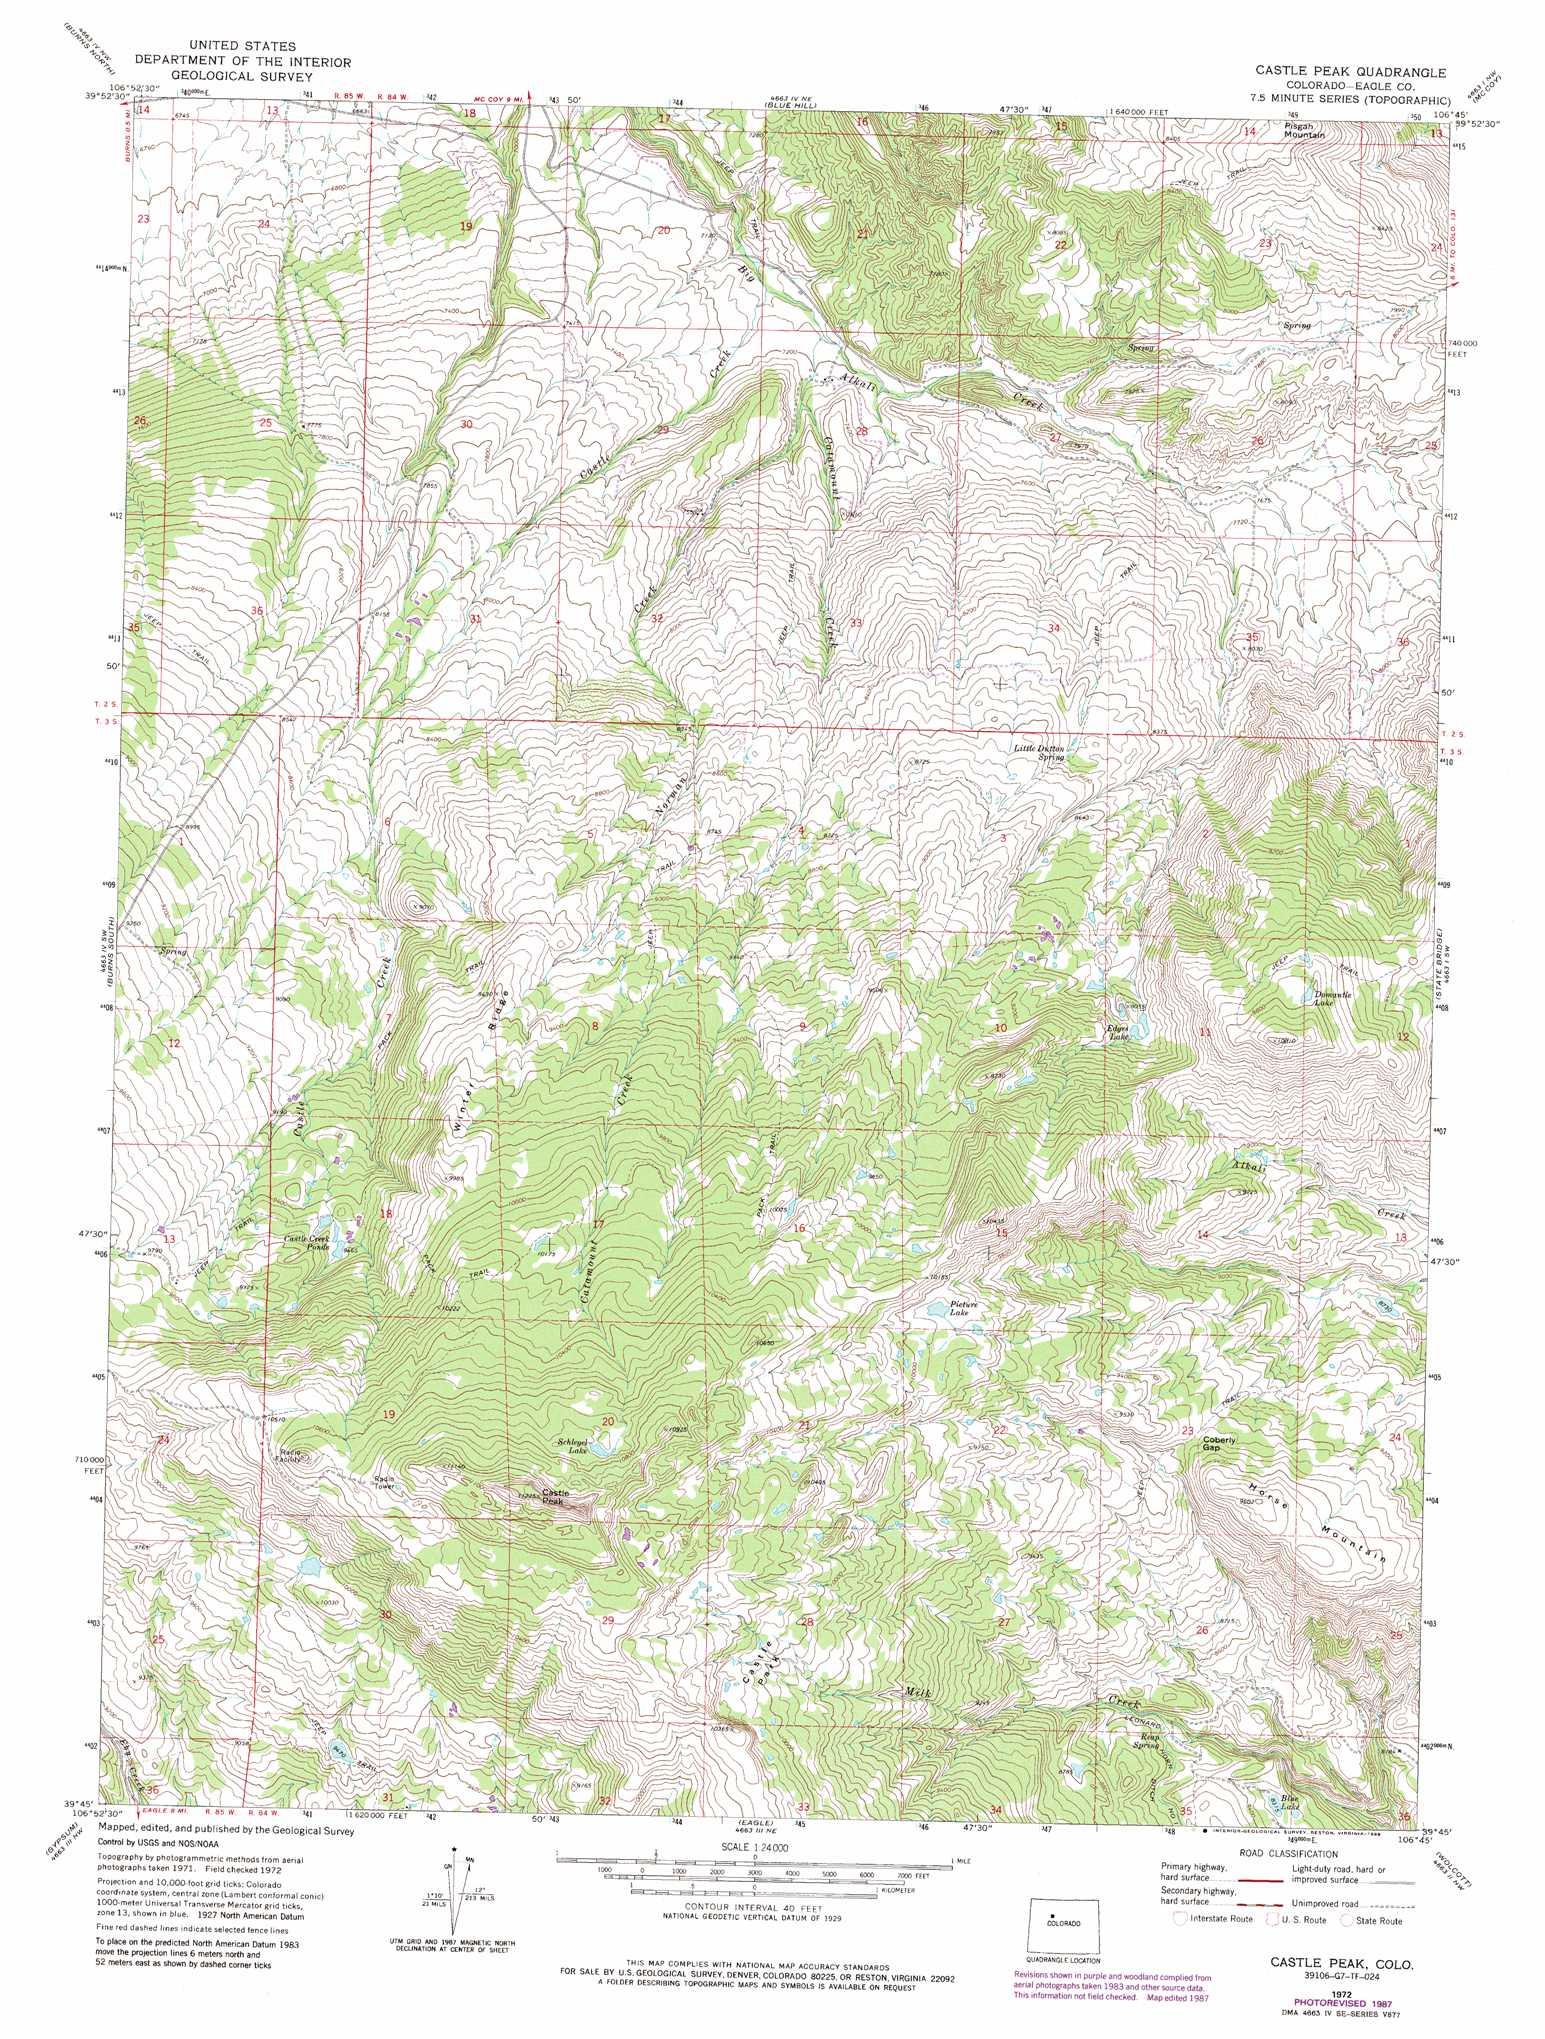 Castle Peak topographic map, CO - USGS Topo Quad 39106g7 on